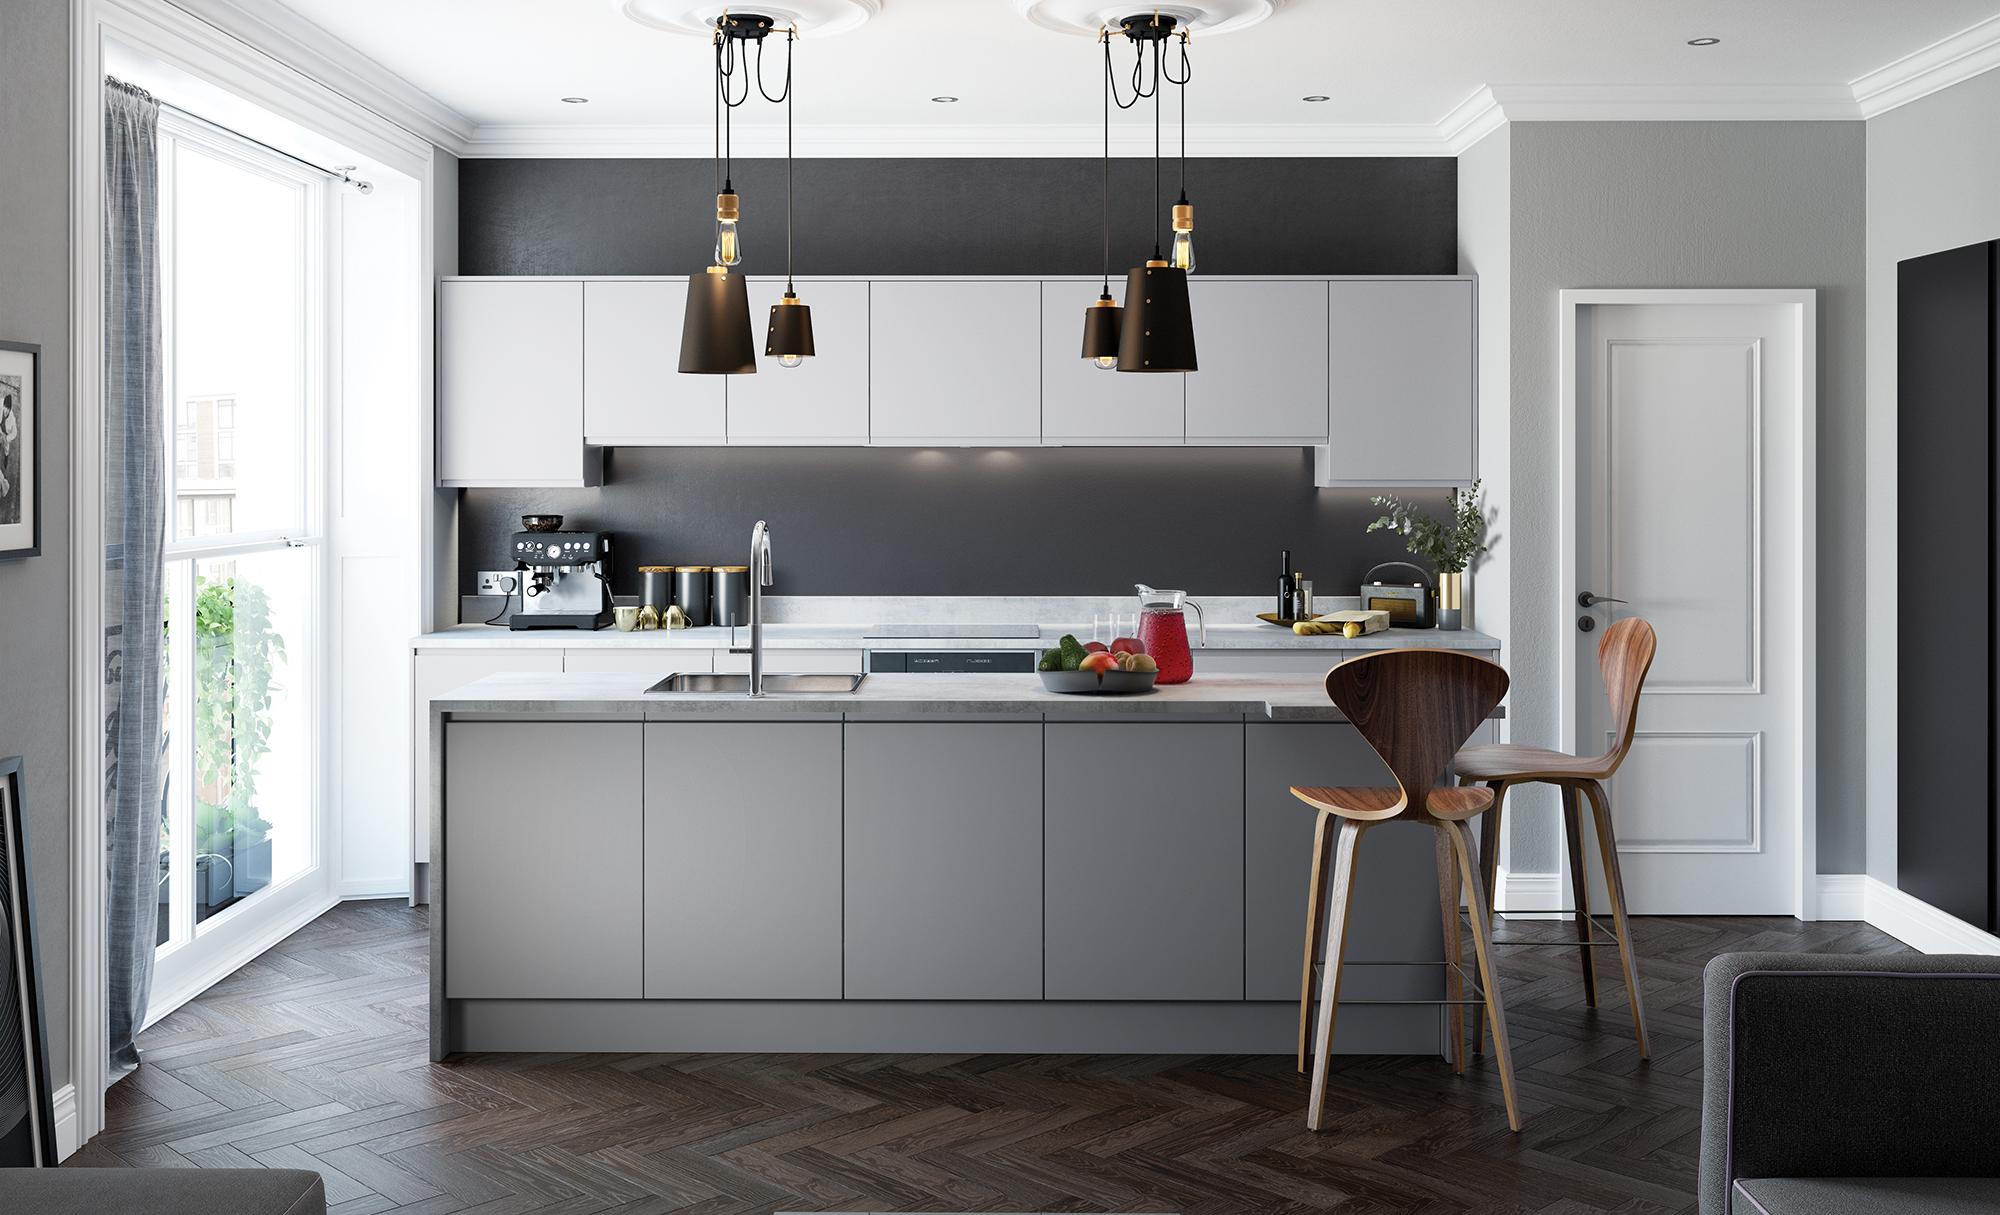 2019 Vermonhouse White Grey Matt Lacuqer Kitchen Modern Buy Kitchen Kitchen Modern Grey Kitchen Product On Alibaba Com